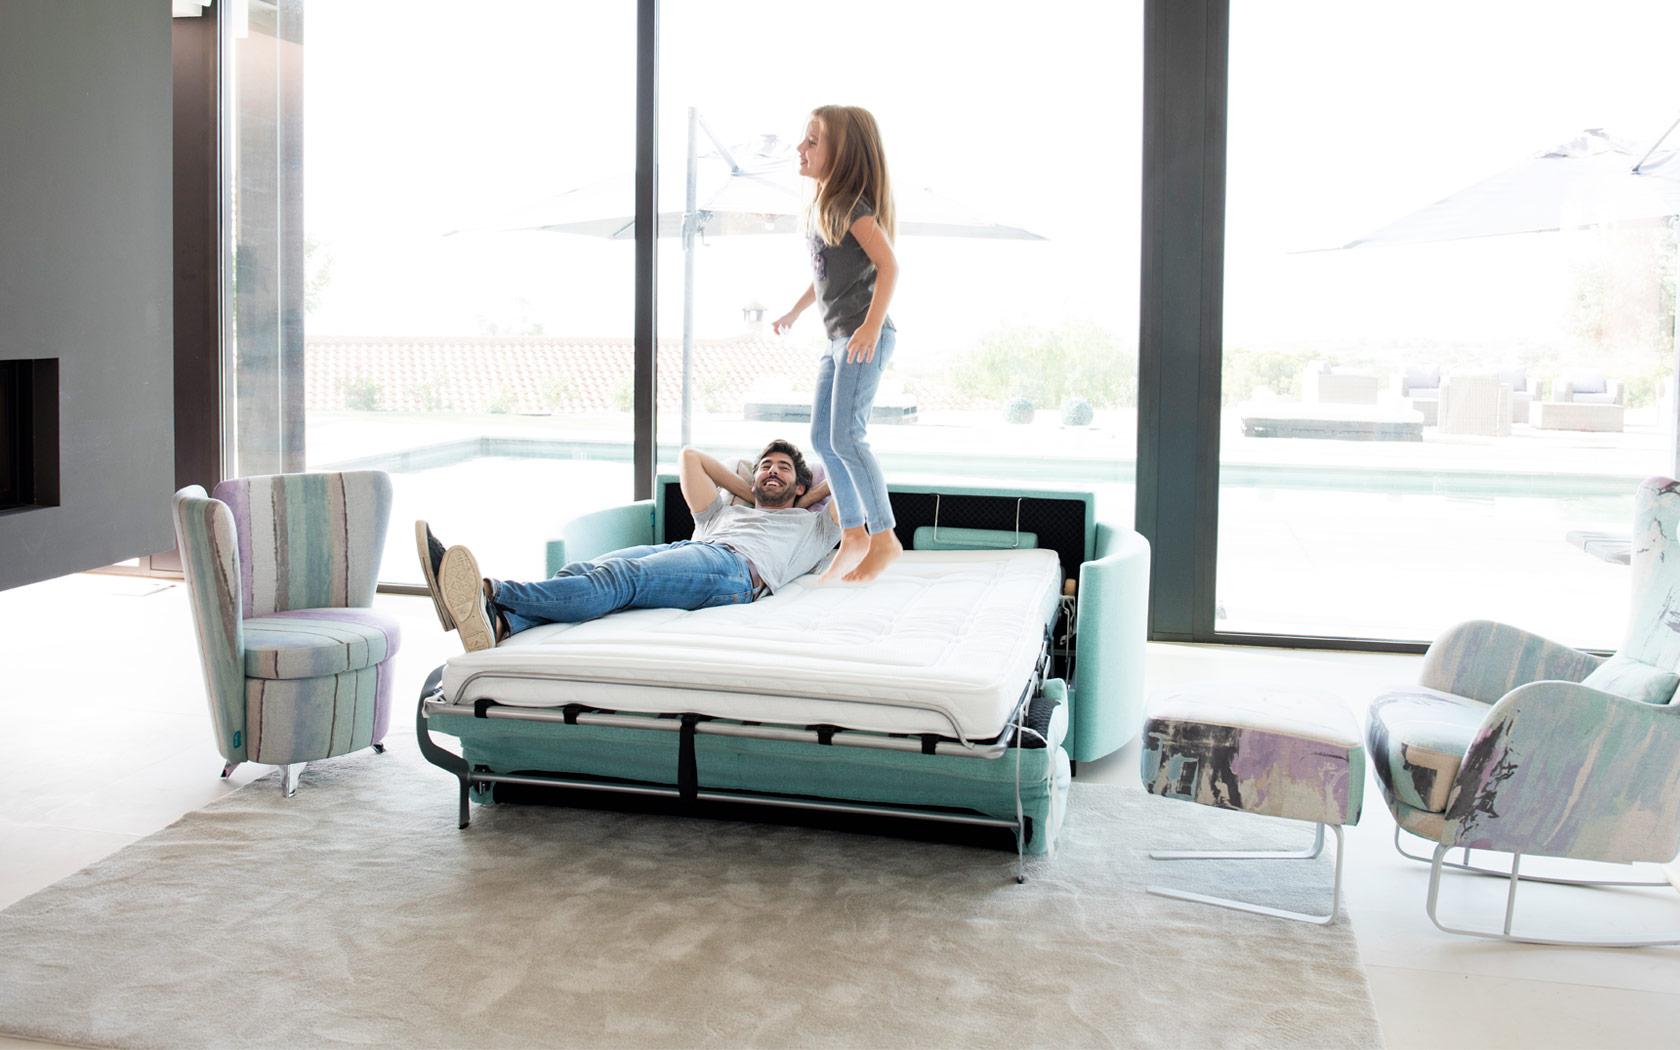 Bolero sofa cama 2019 03